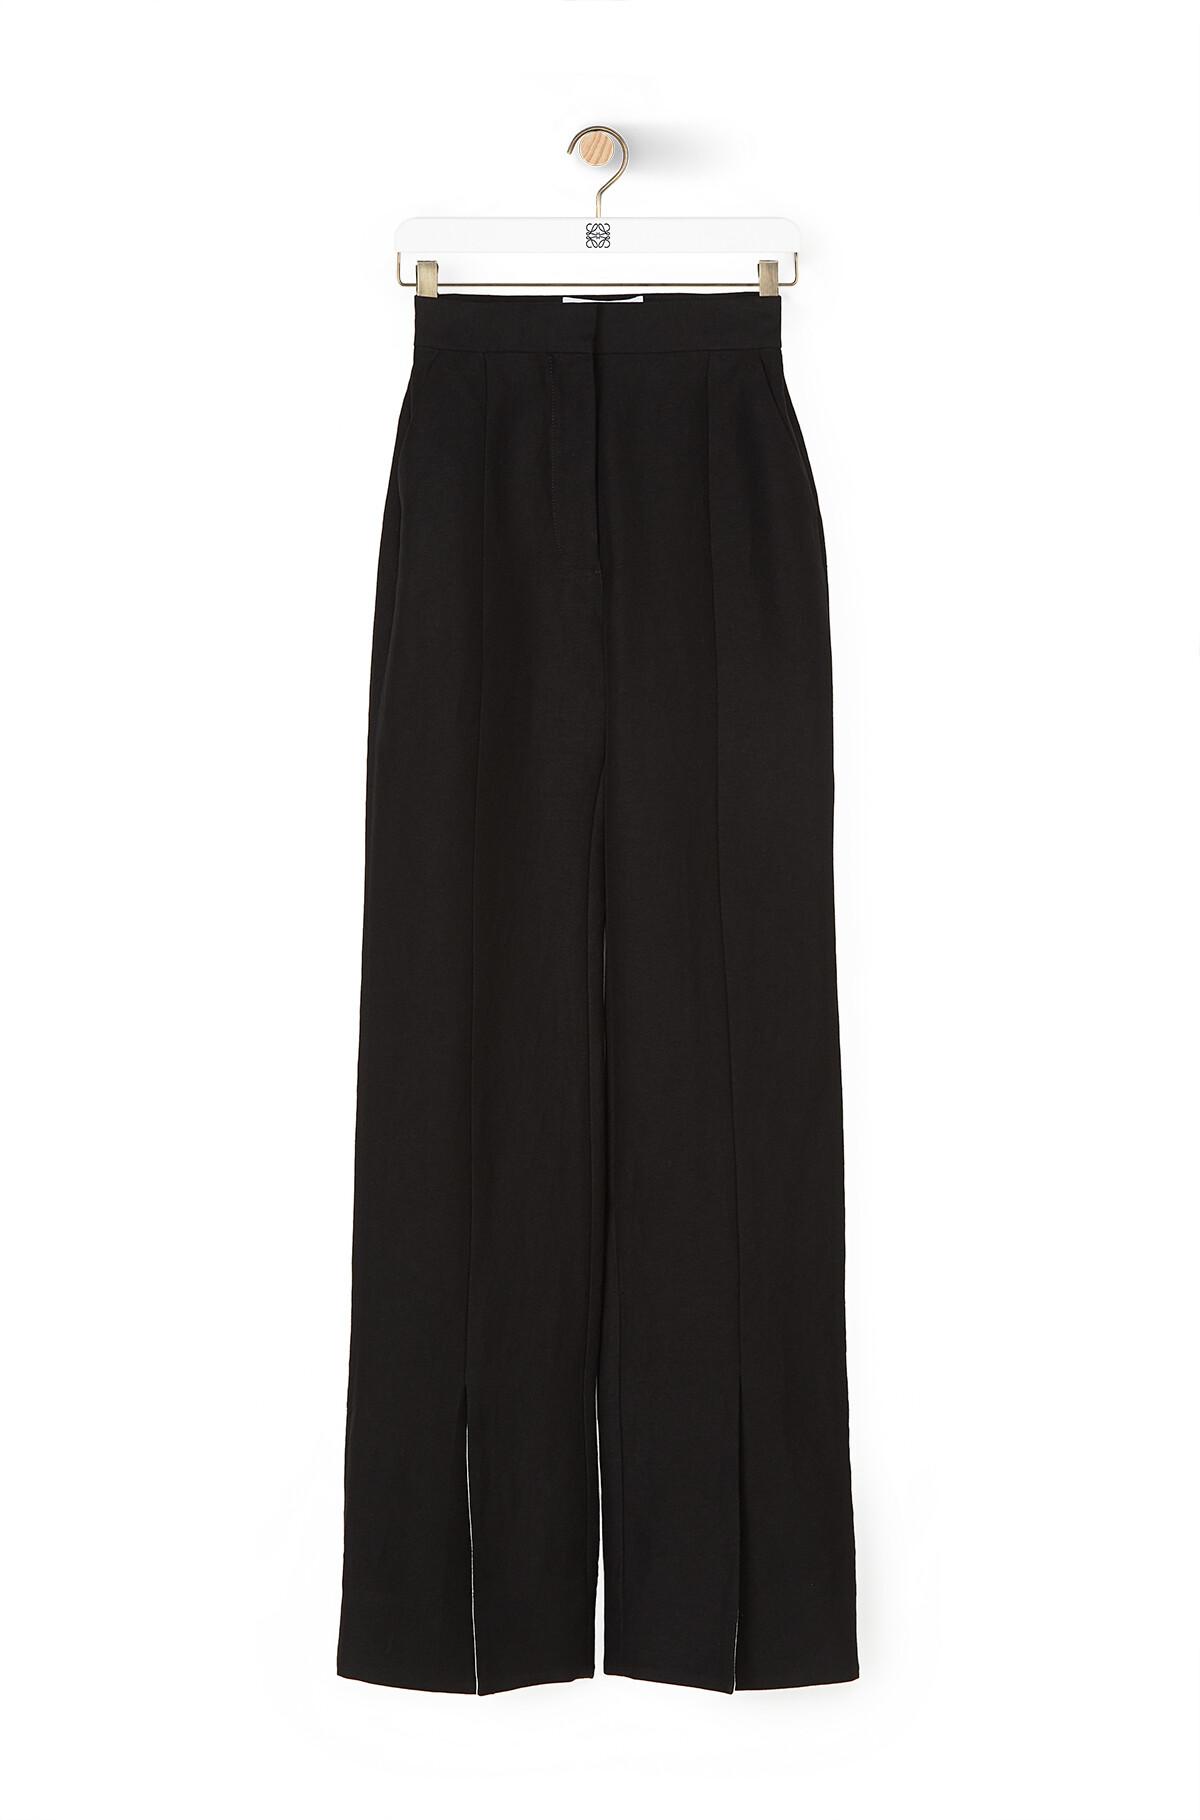 LOEWE Slit Trousers Black front